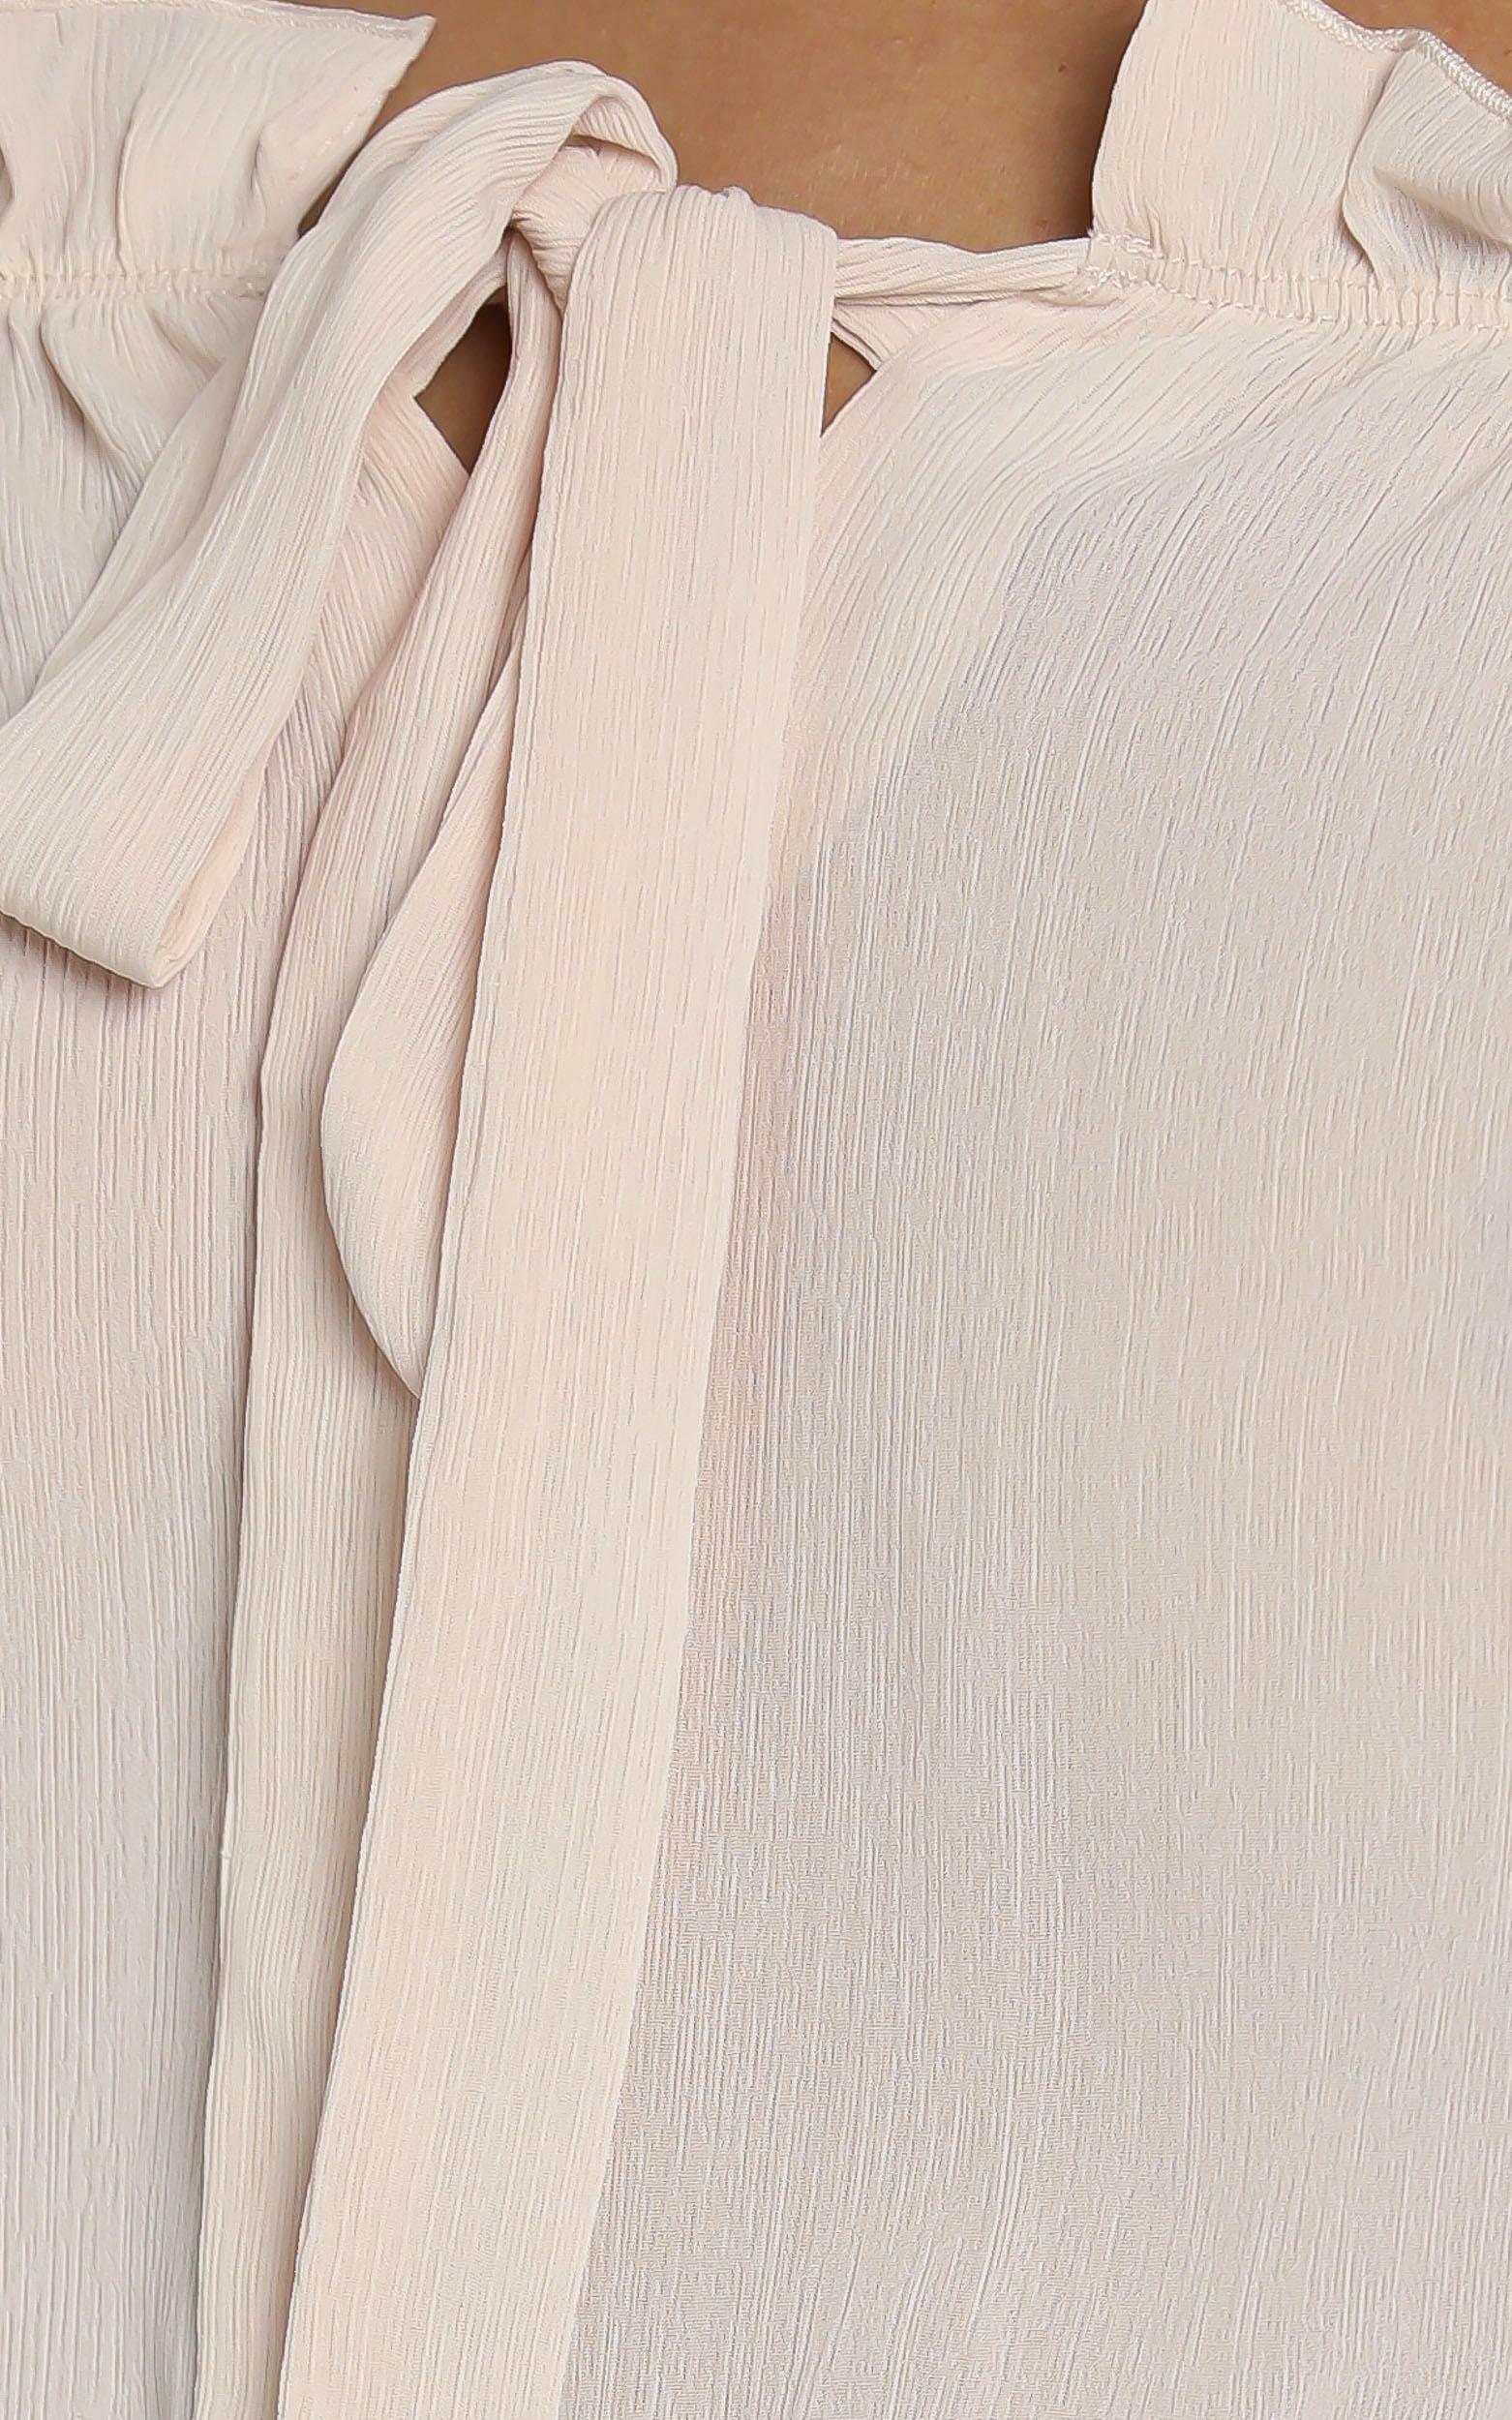 Ronny Dress in Blush - 12 (L), Blue, hi-res image number null